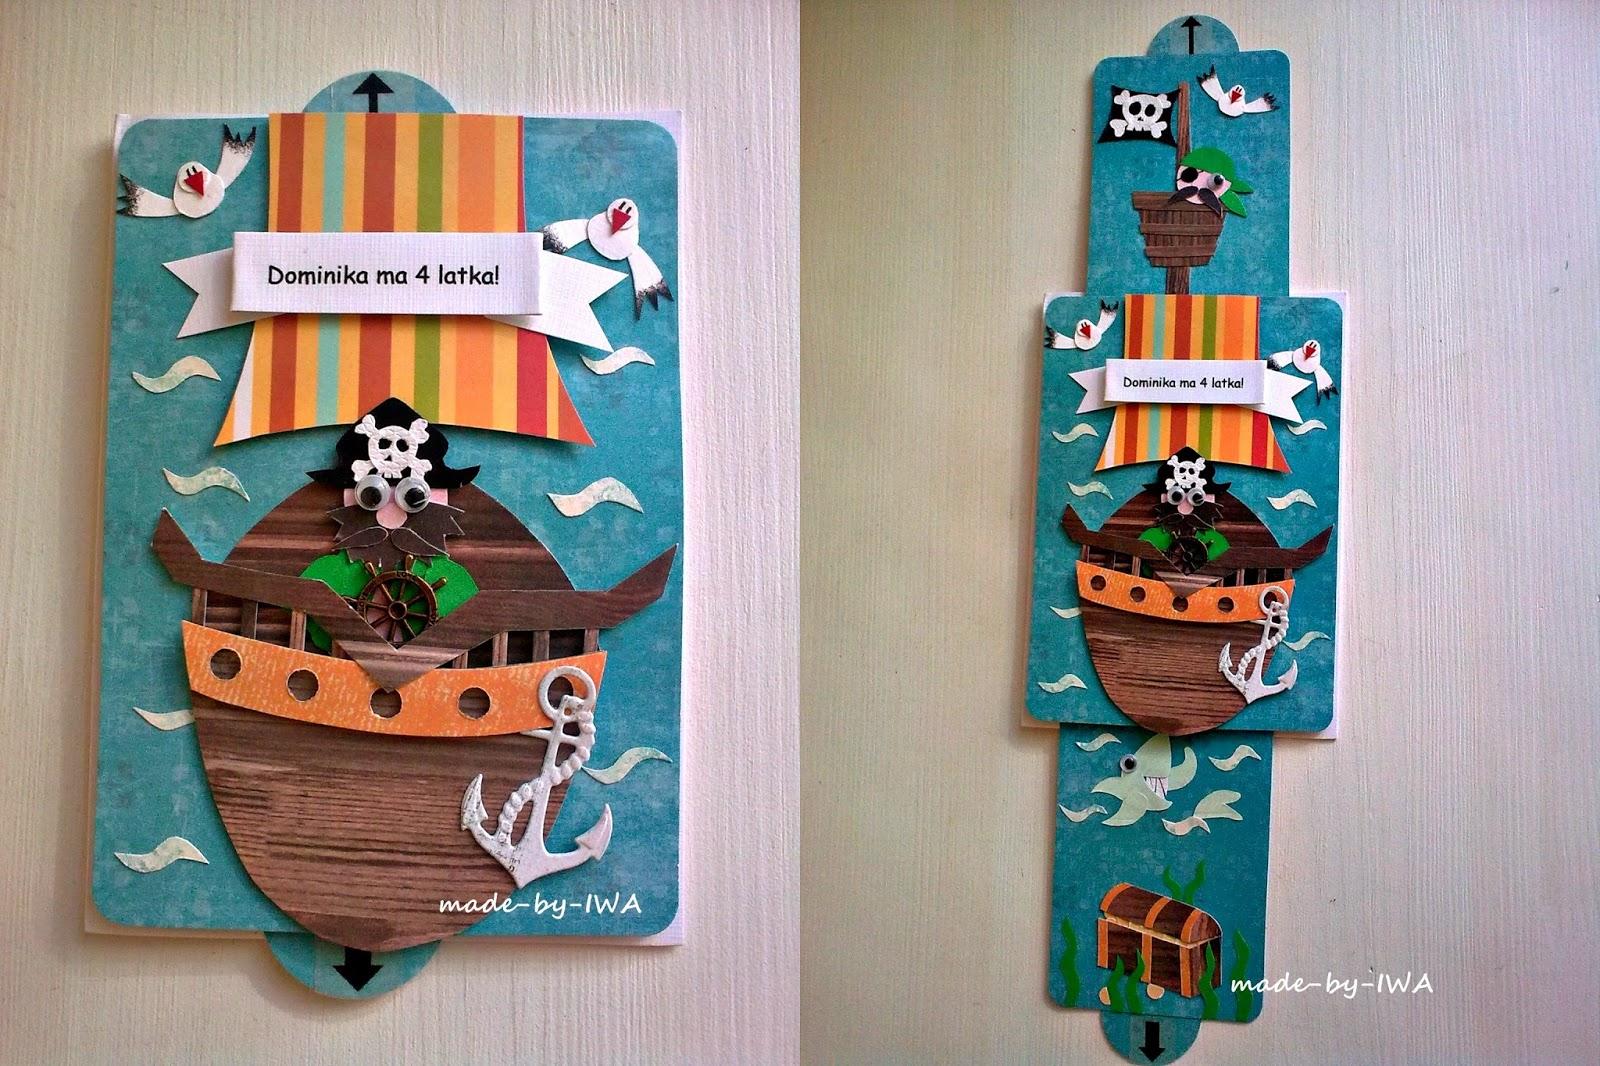 http://made-by-iwa.blogspot.com/2013/09/jak-morze.html